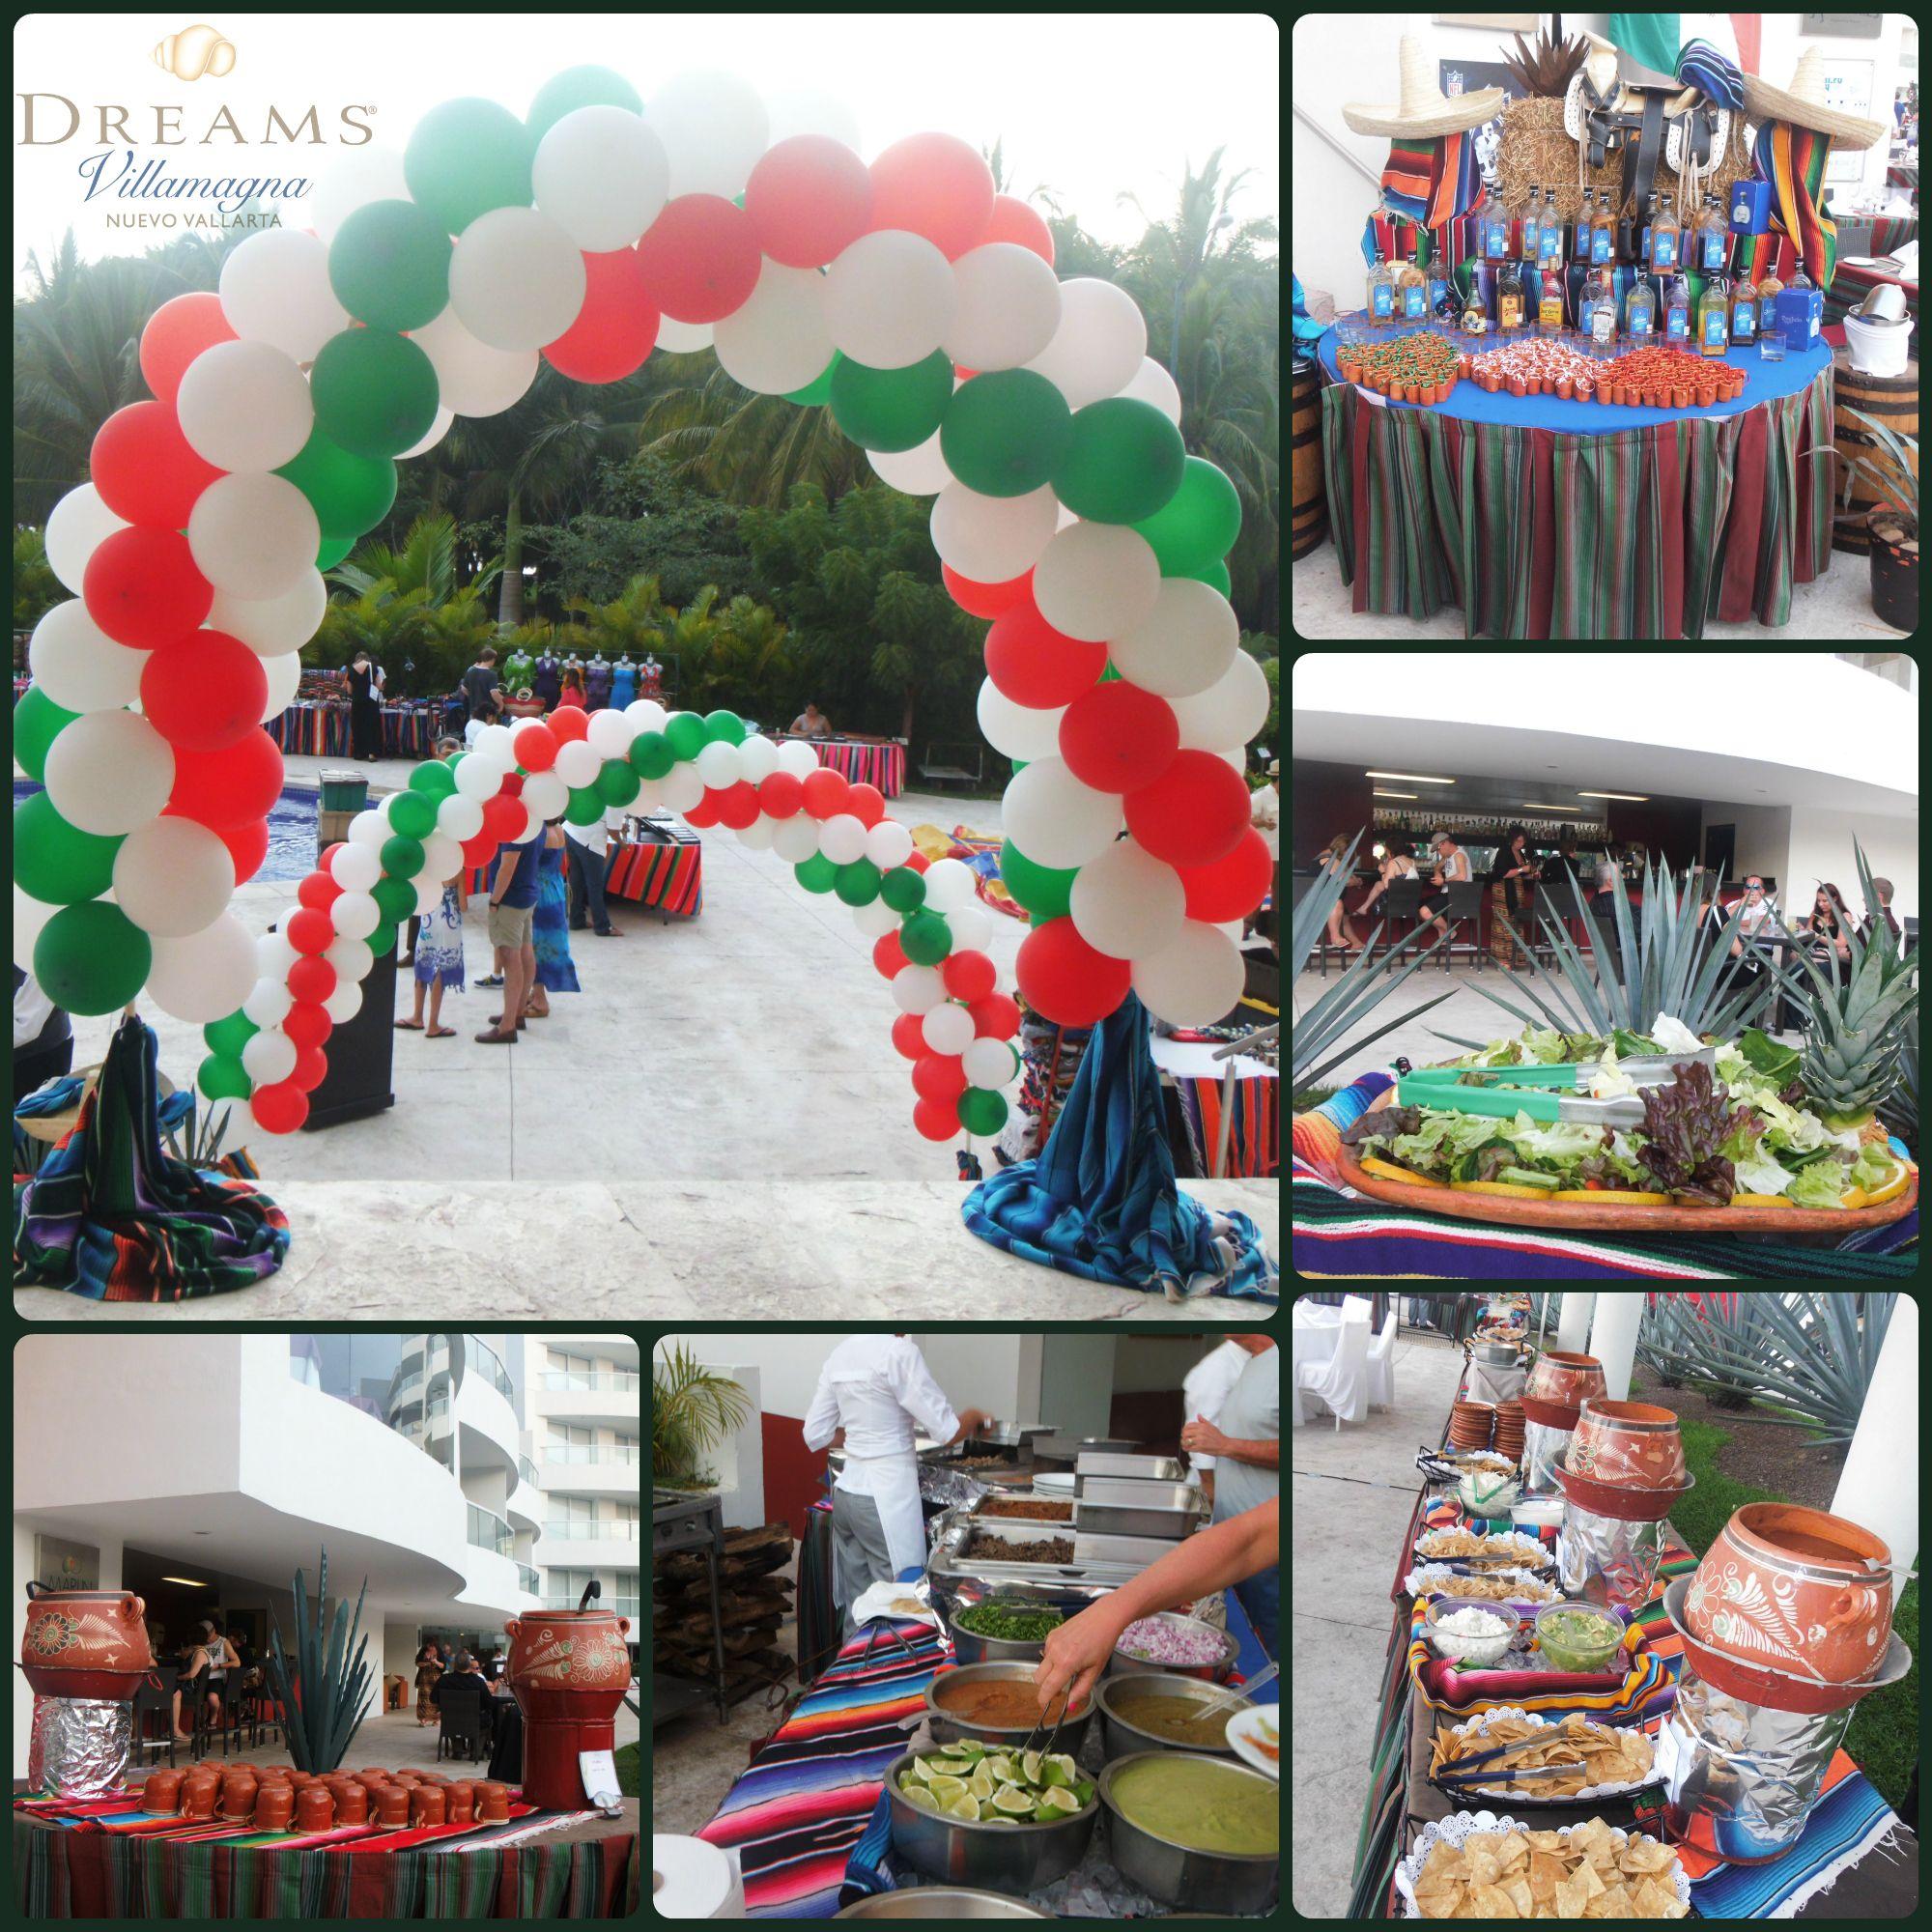 Mexican fiesta mexicana party fiesta mexicana for Decoracion mexicana